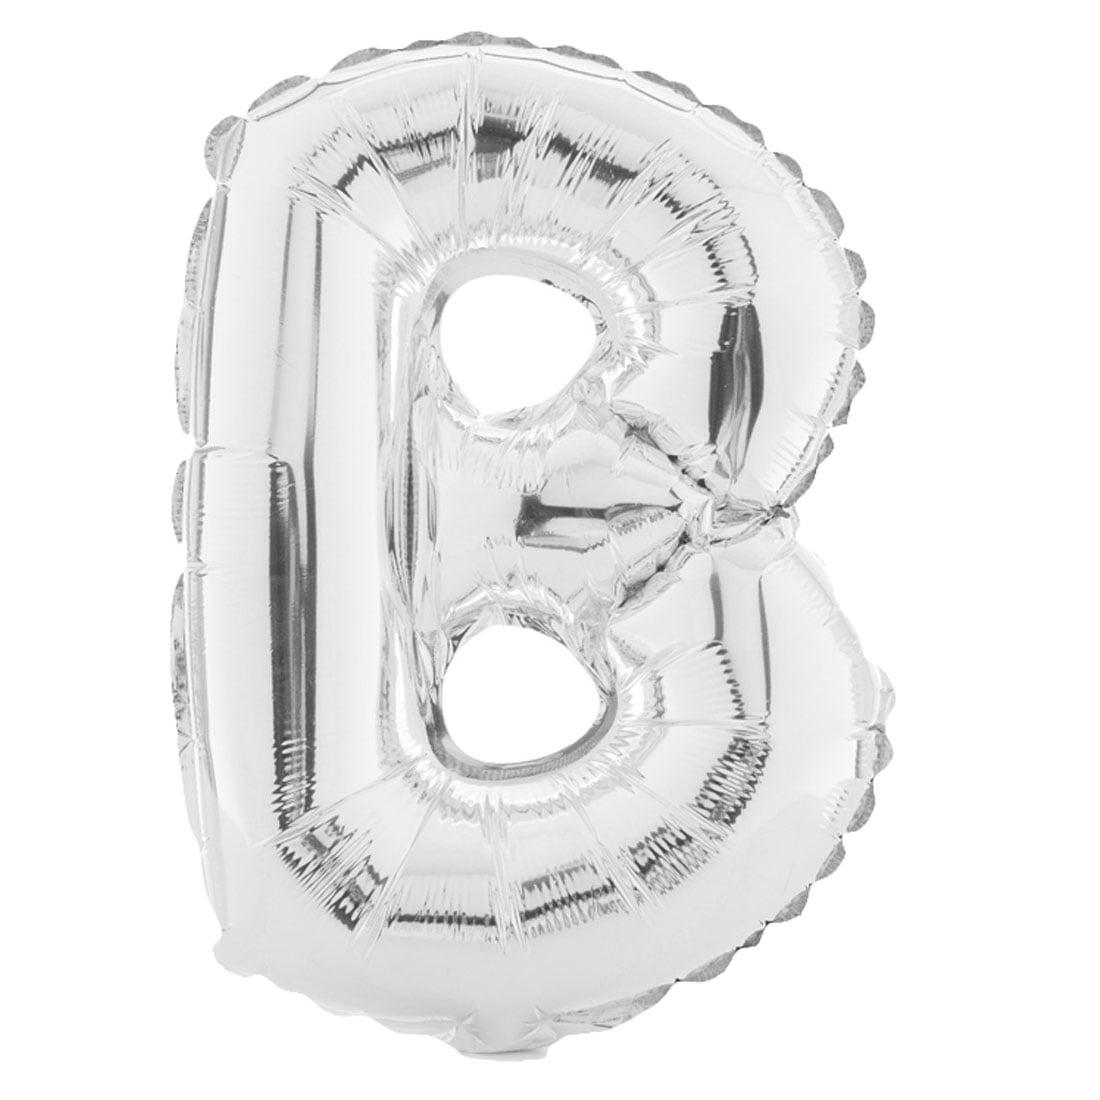 "Unique Bargains 16"" Silver Tone Letter B Balloon Helium Birthday Wedding Festival Decor"